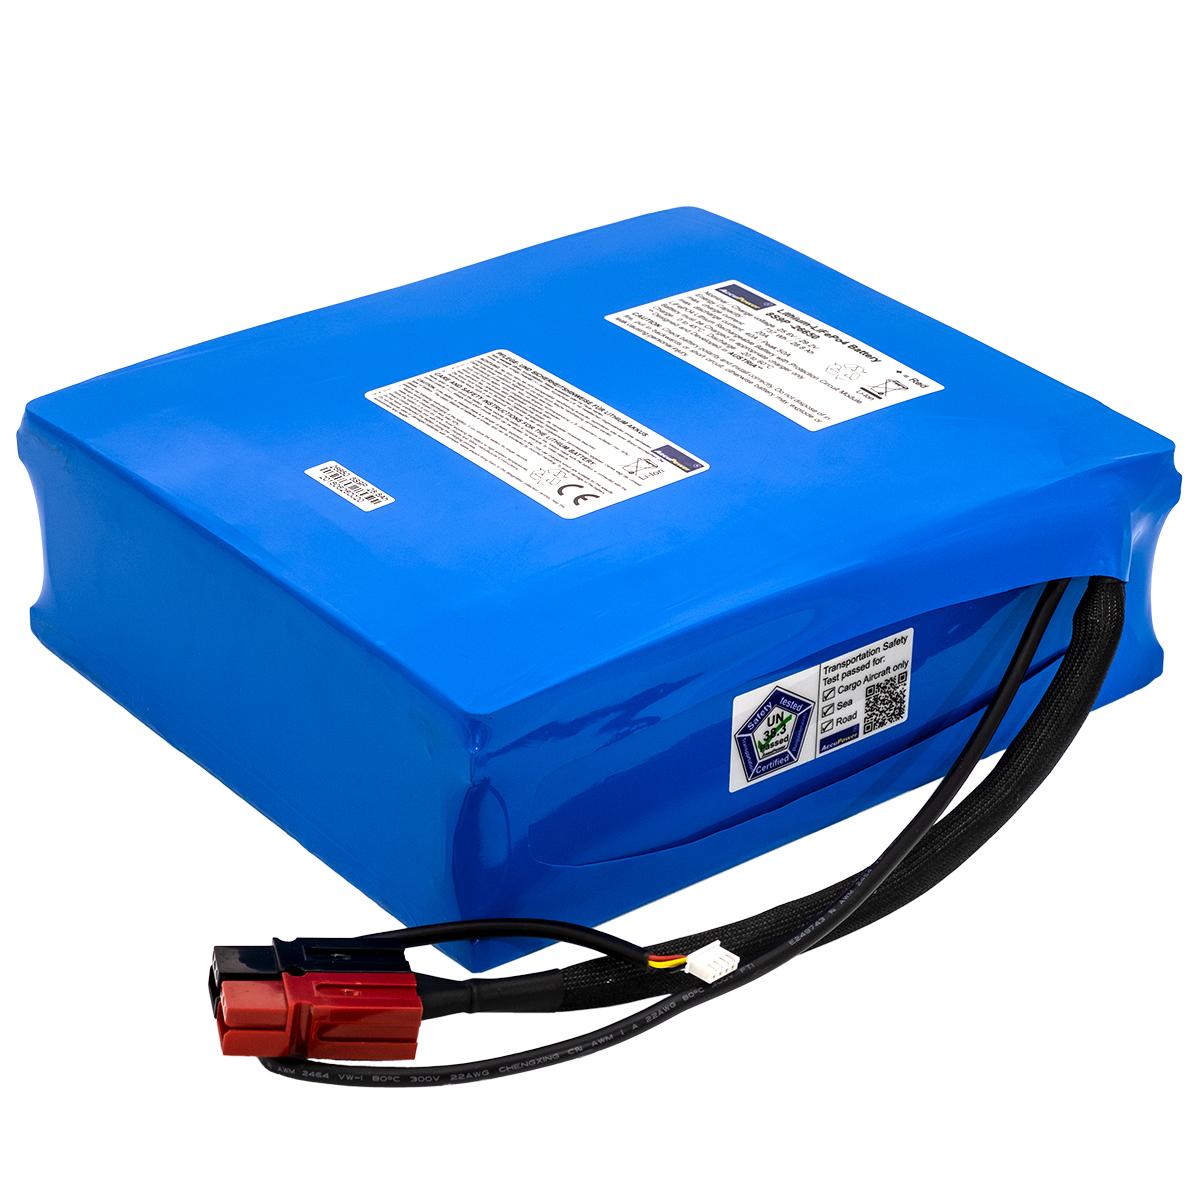 AccuPower LiFePO4 Akku 8S9P 25,6V 28,8Ah 737Wh mit Schnittstelle